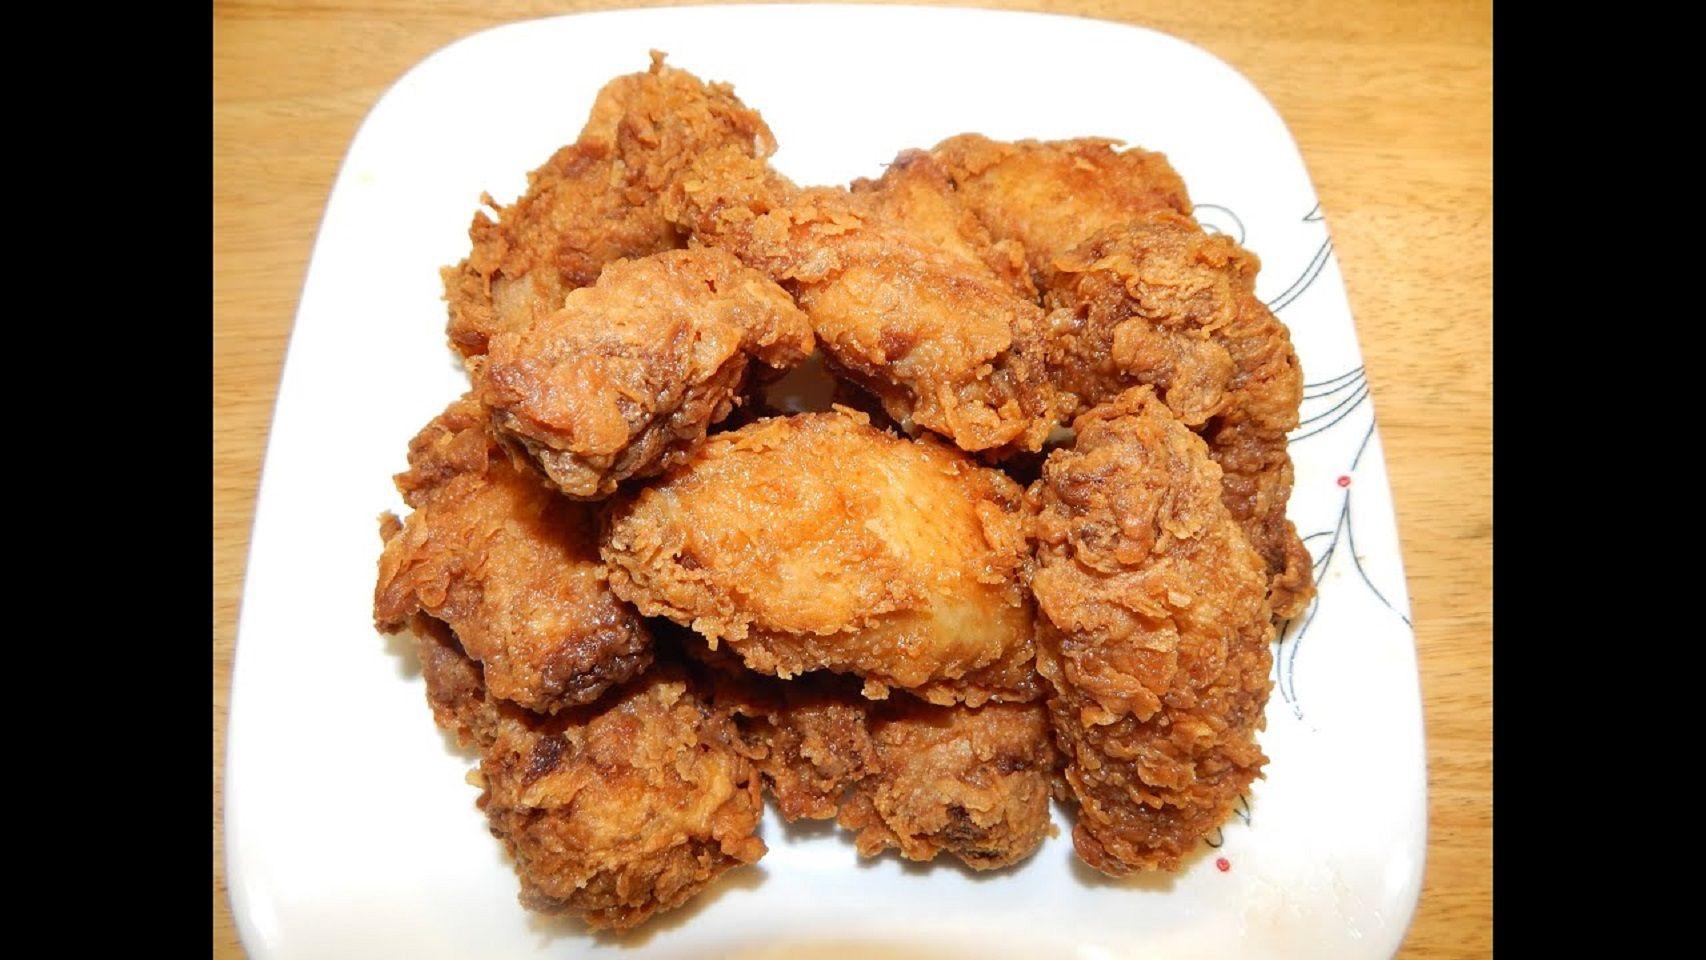 Buttermilk Fried Chicken Wings Recipe In 2020 Marinated Chicken Recipes Buttermilk Fried Chicken Chicken And Beef Recipe